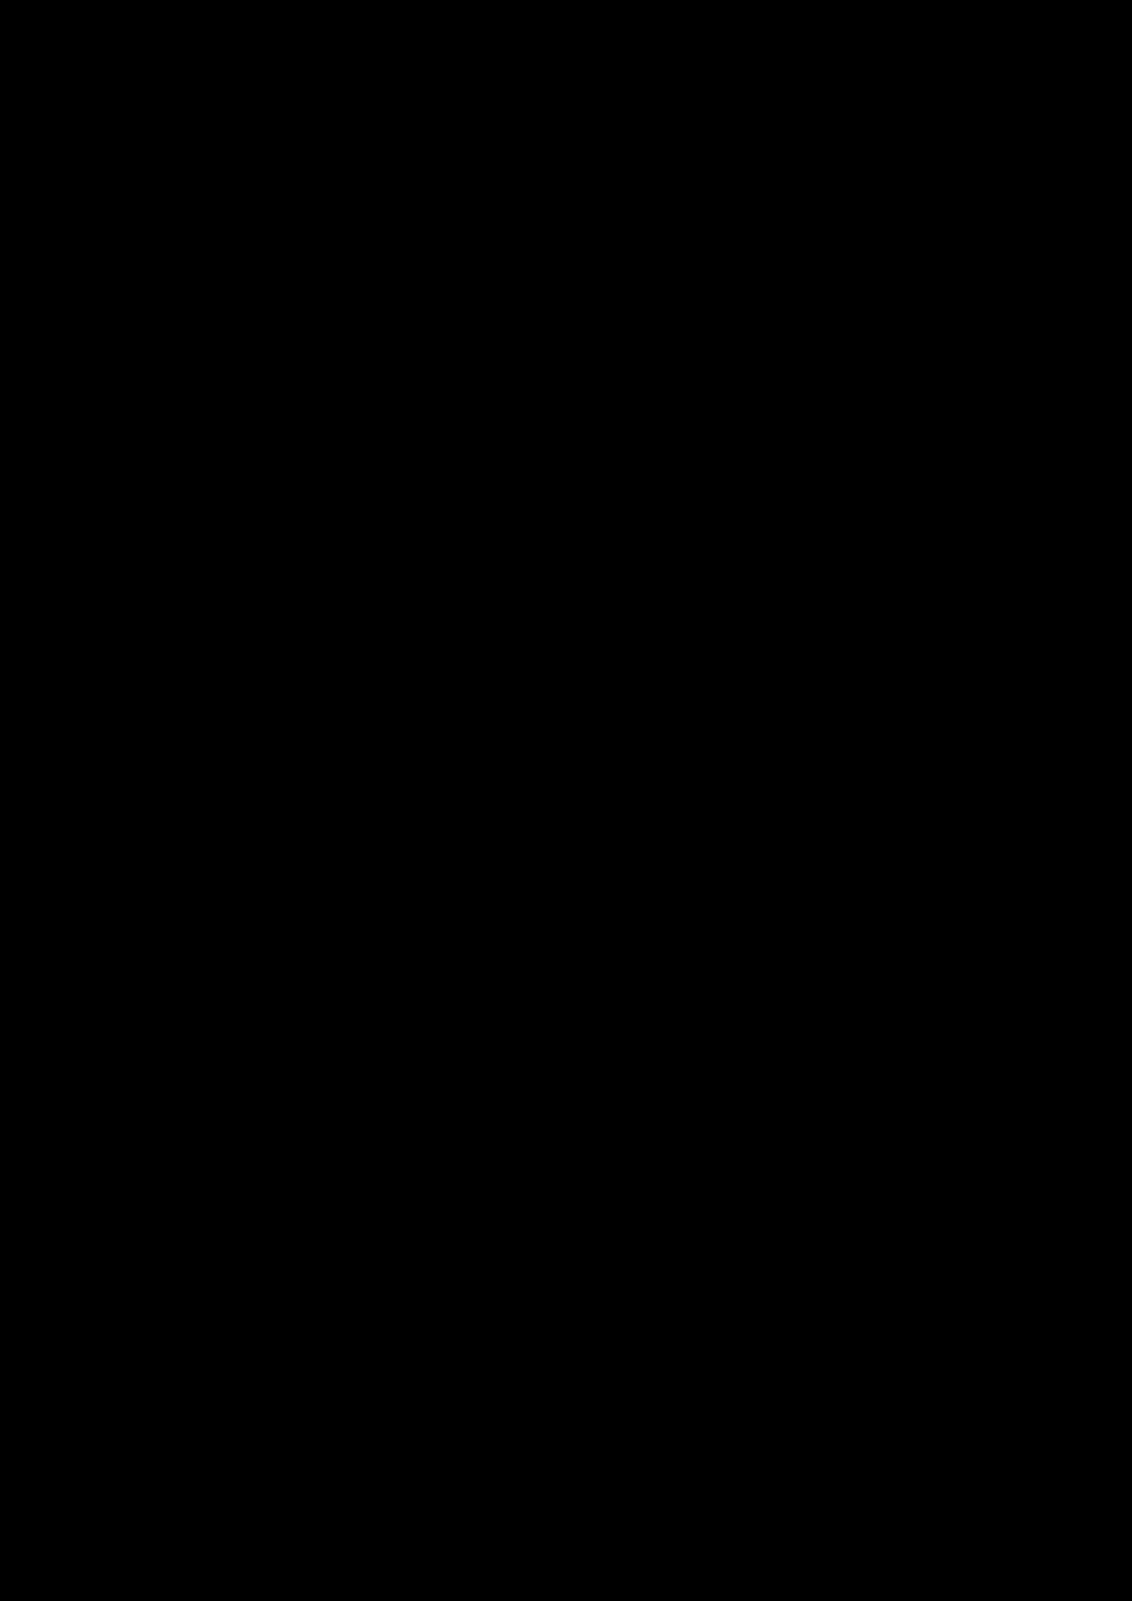 Okean Pustotyi slide, Image 41